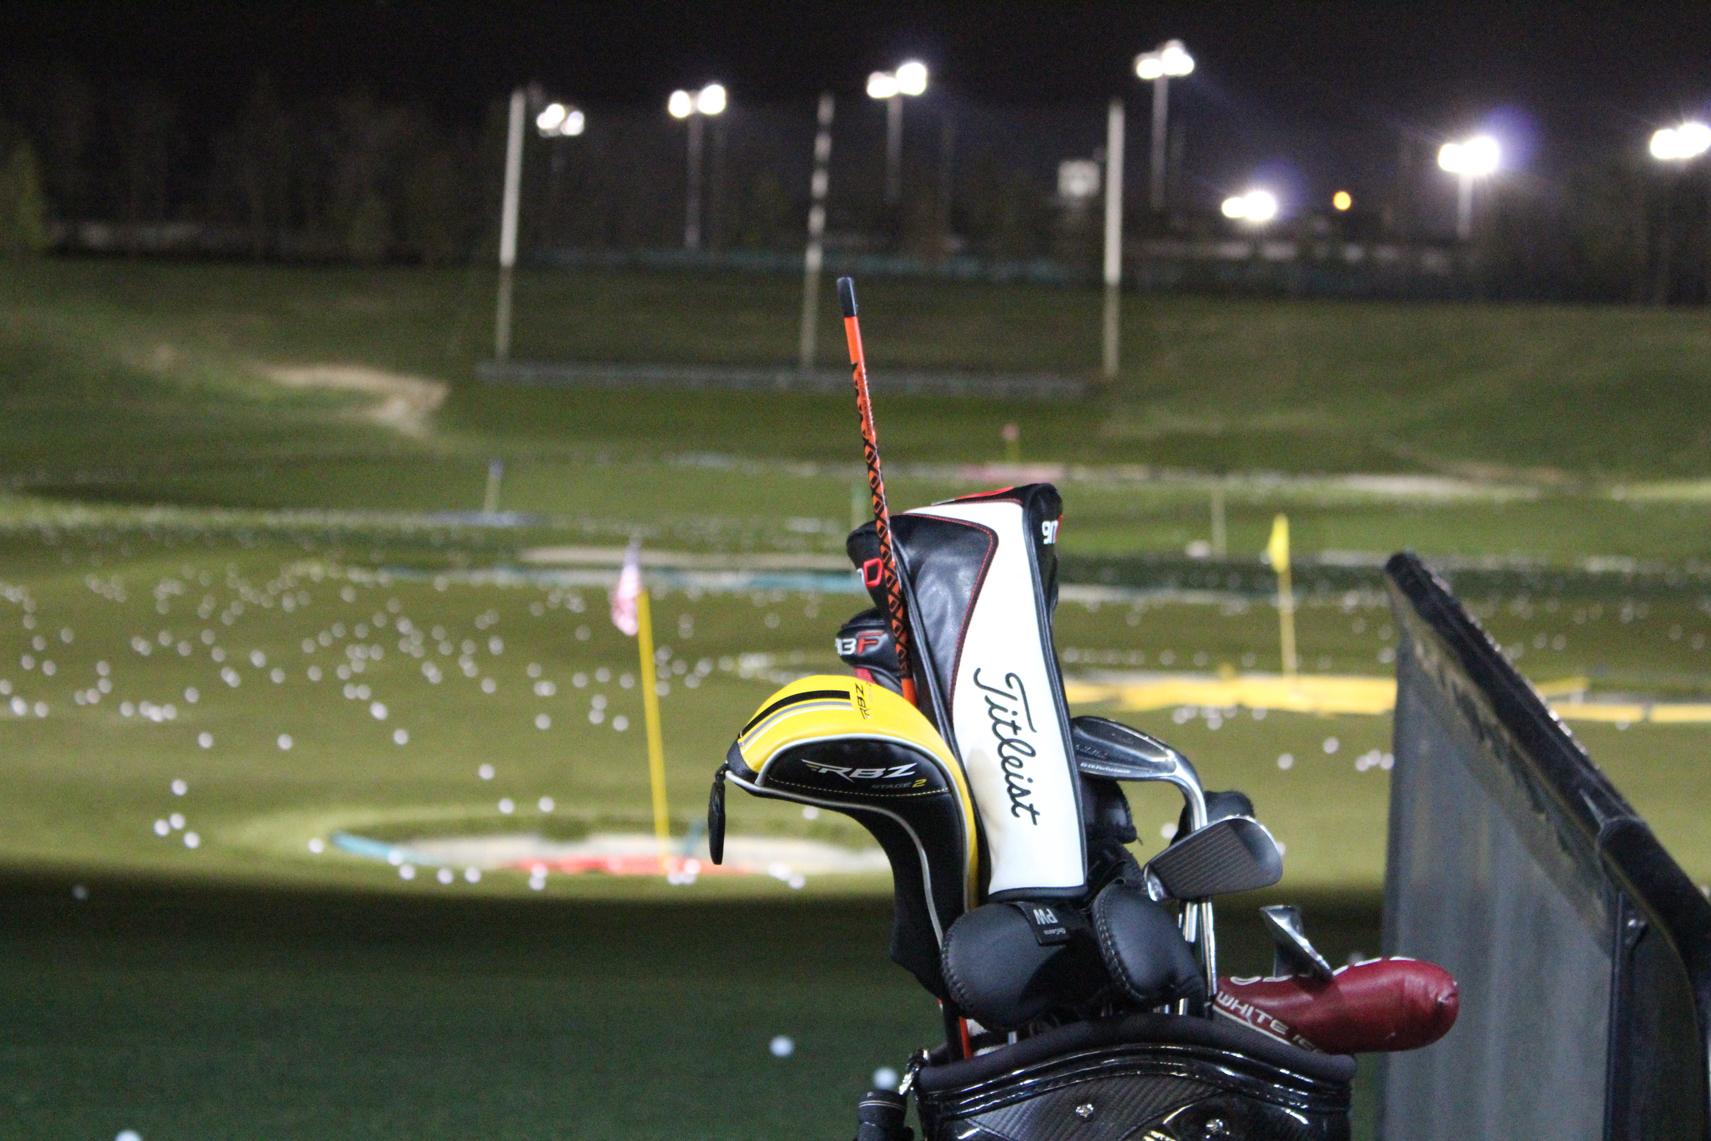 Top 5 Best Golf Hybrid Clubs 2018